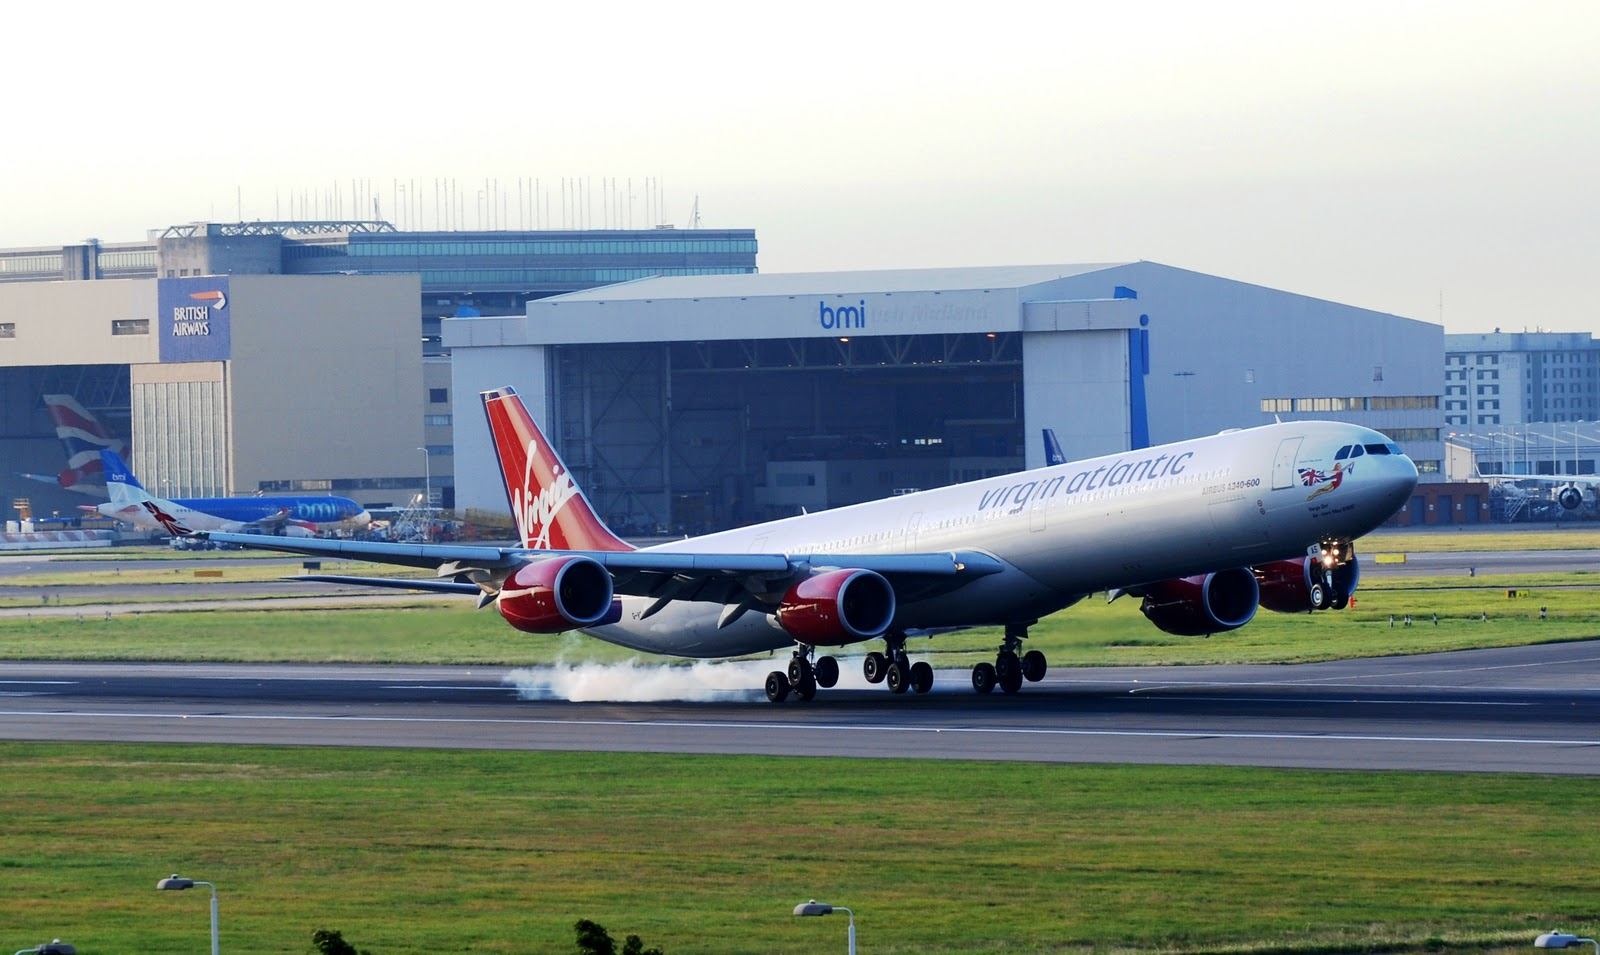 http://1.bp.blogspot.com/-xnc67sAJ3NA/TpDhlnwBEfI/AAAAAAAAGZs/fGaq7HXnUrY/s1600/a340_600_virgin_atlantic_landing.jpg